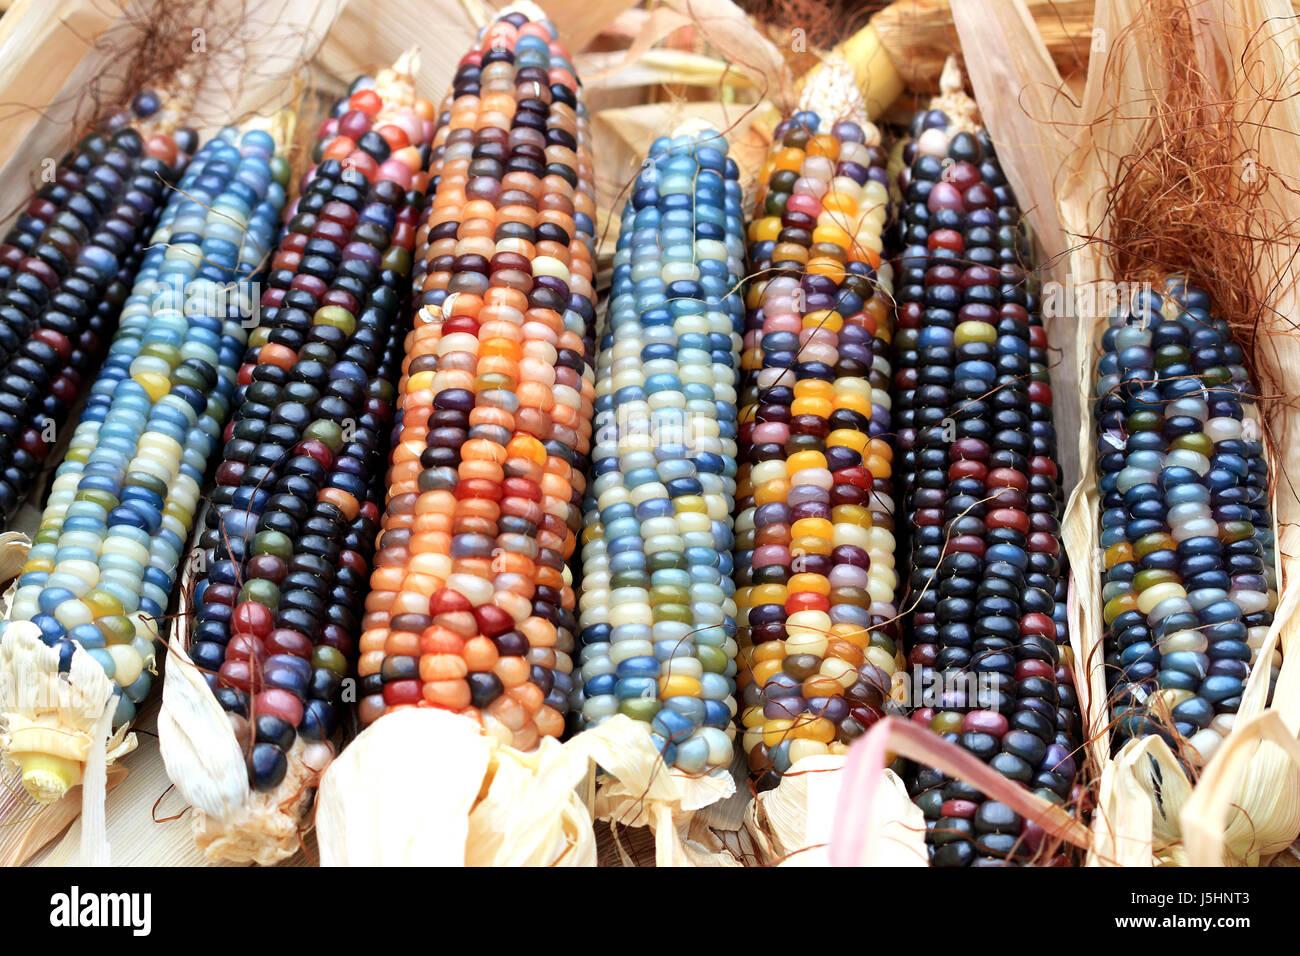 close-up-of-glass-gem-corn-J5HNT3.jpg